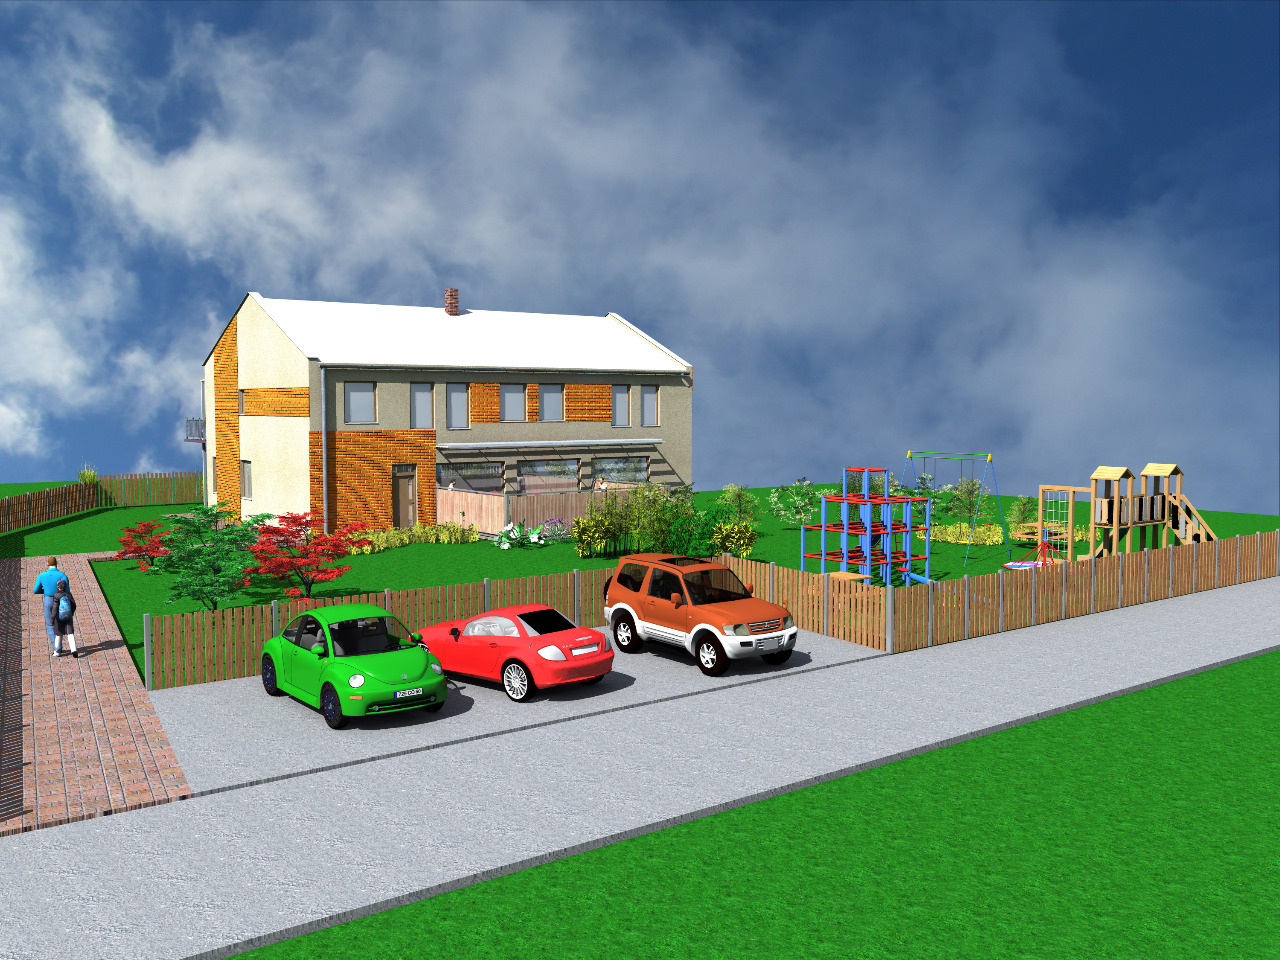 Návrh a architektonická studie staveb